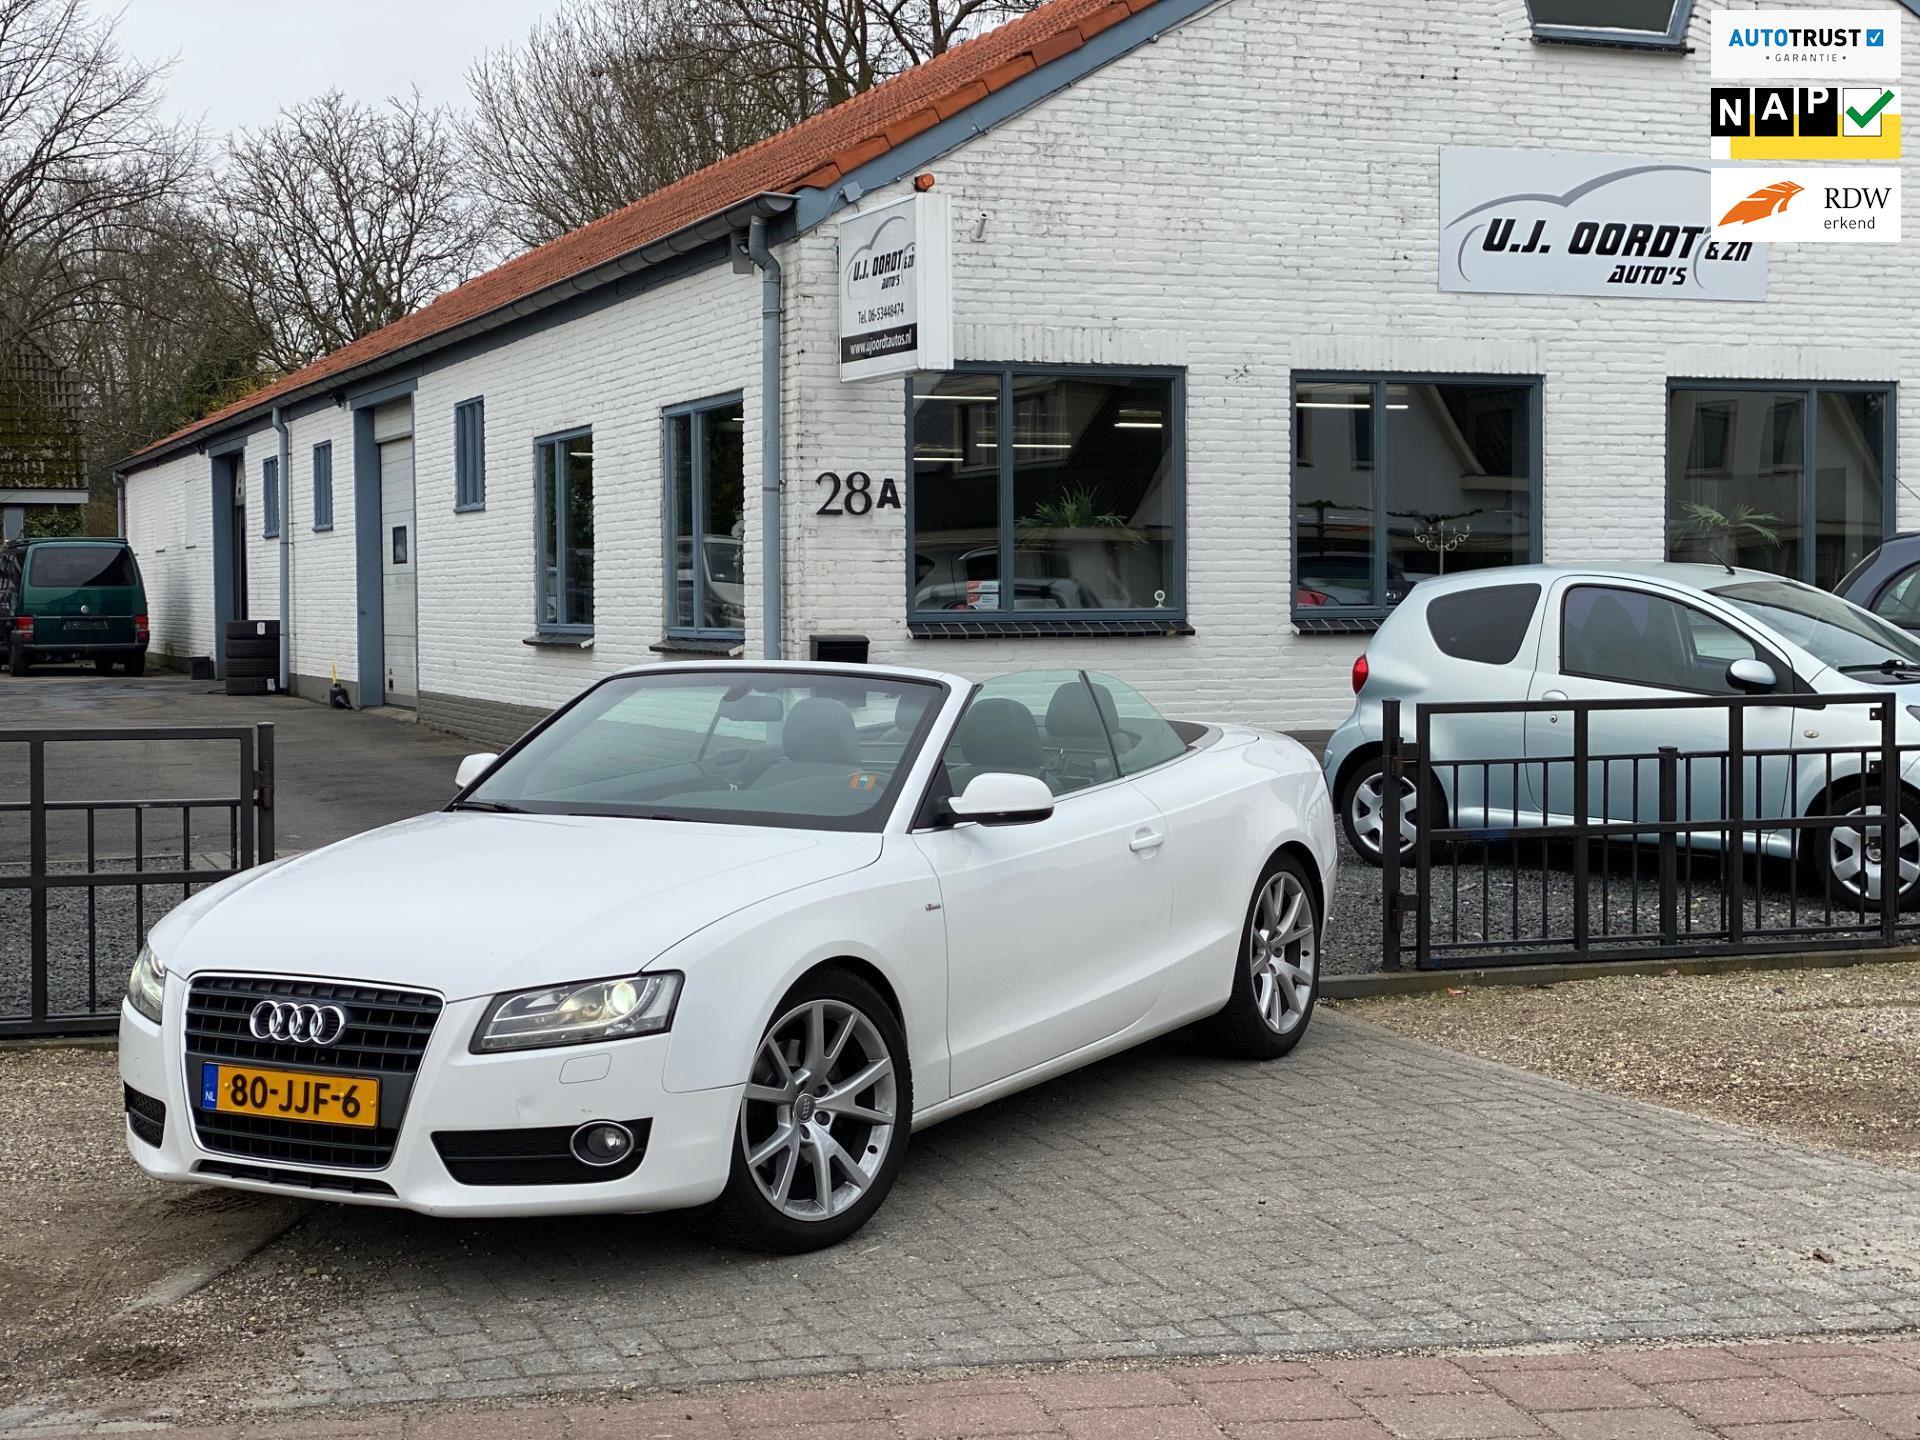 Audi A5 Cabriolet occasion - U.J. Oordt Auto's